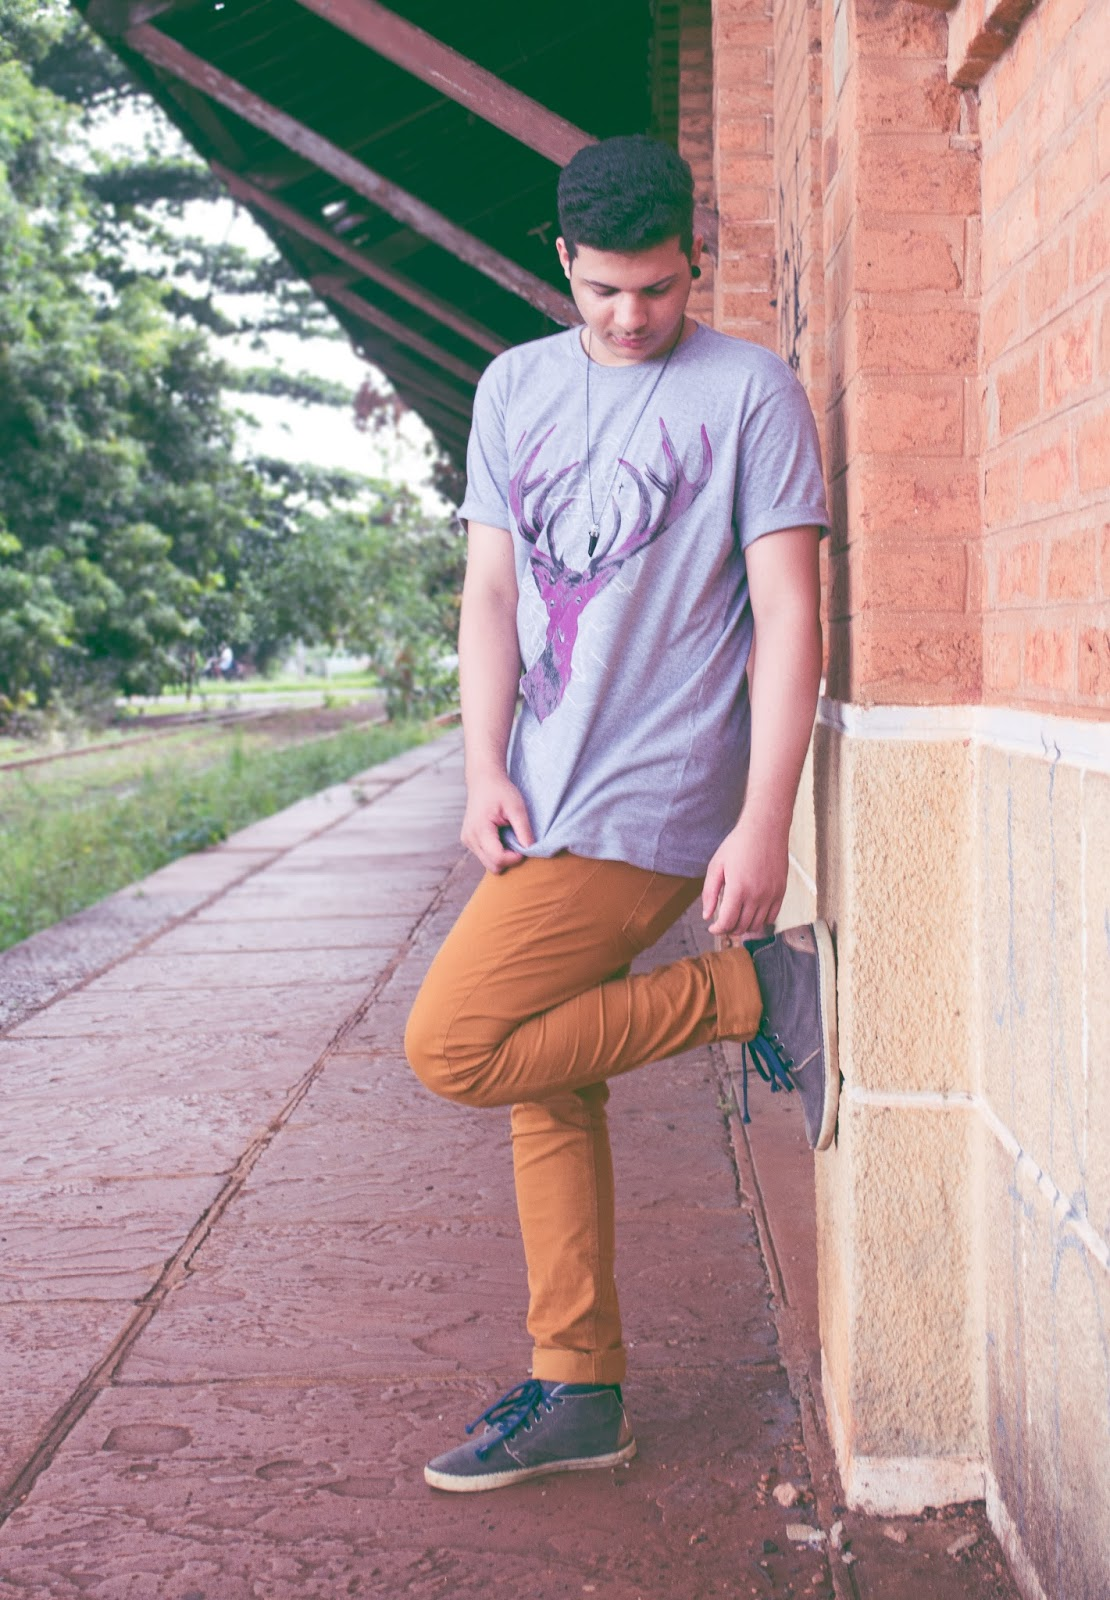 Longline masculina com calça marrom (!)